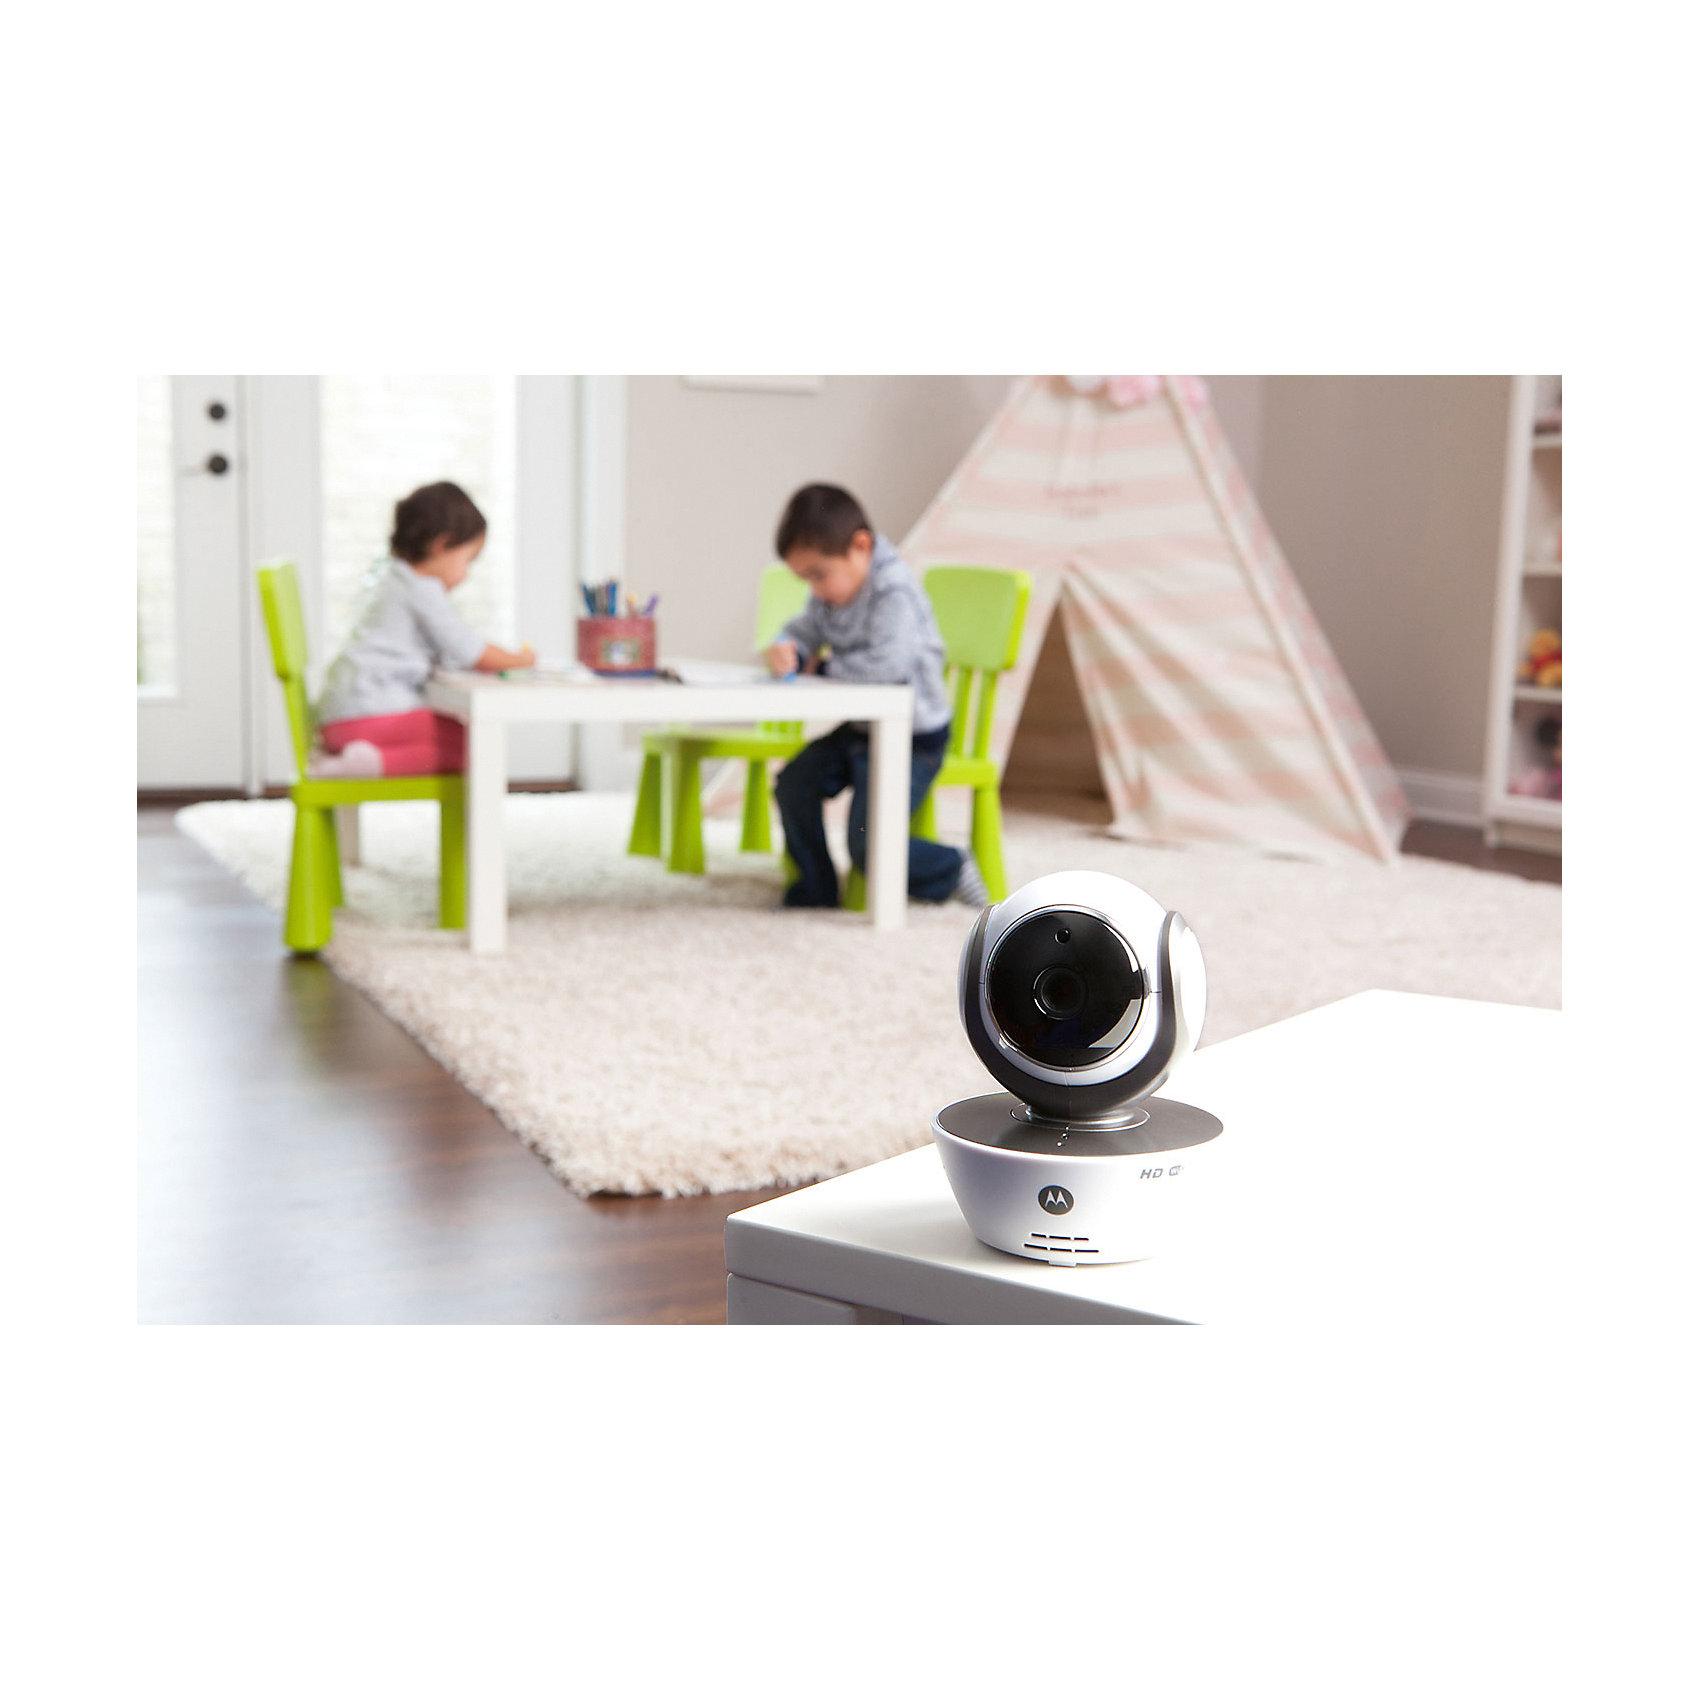 Видеоняня Wi-Fi камера MBP85CONNECT Motorola, белый